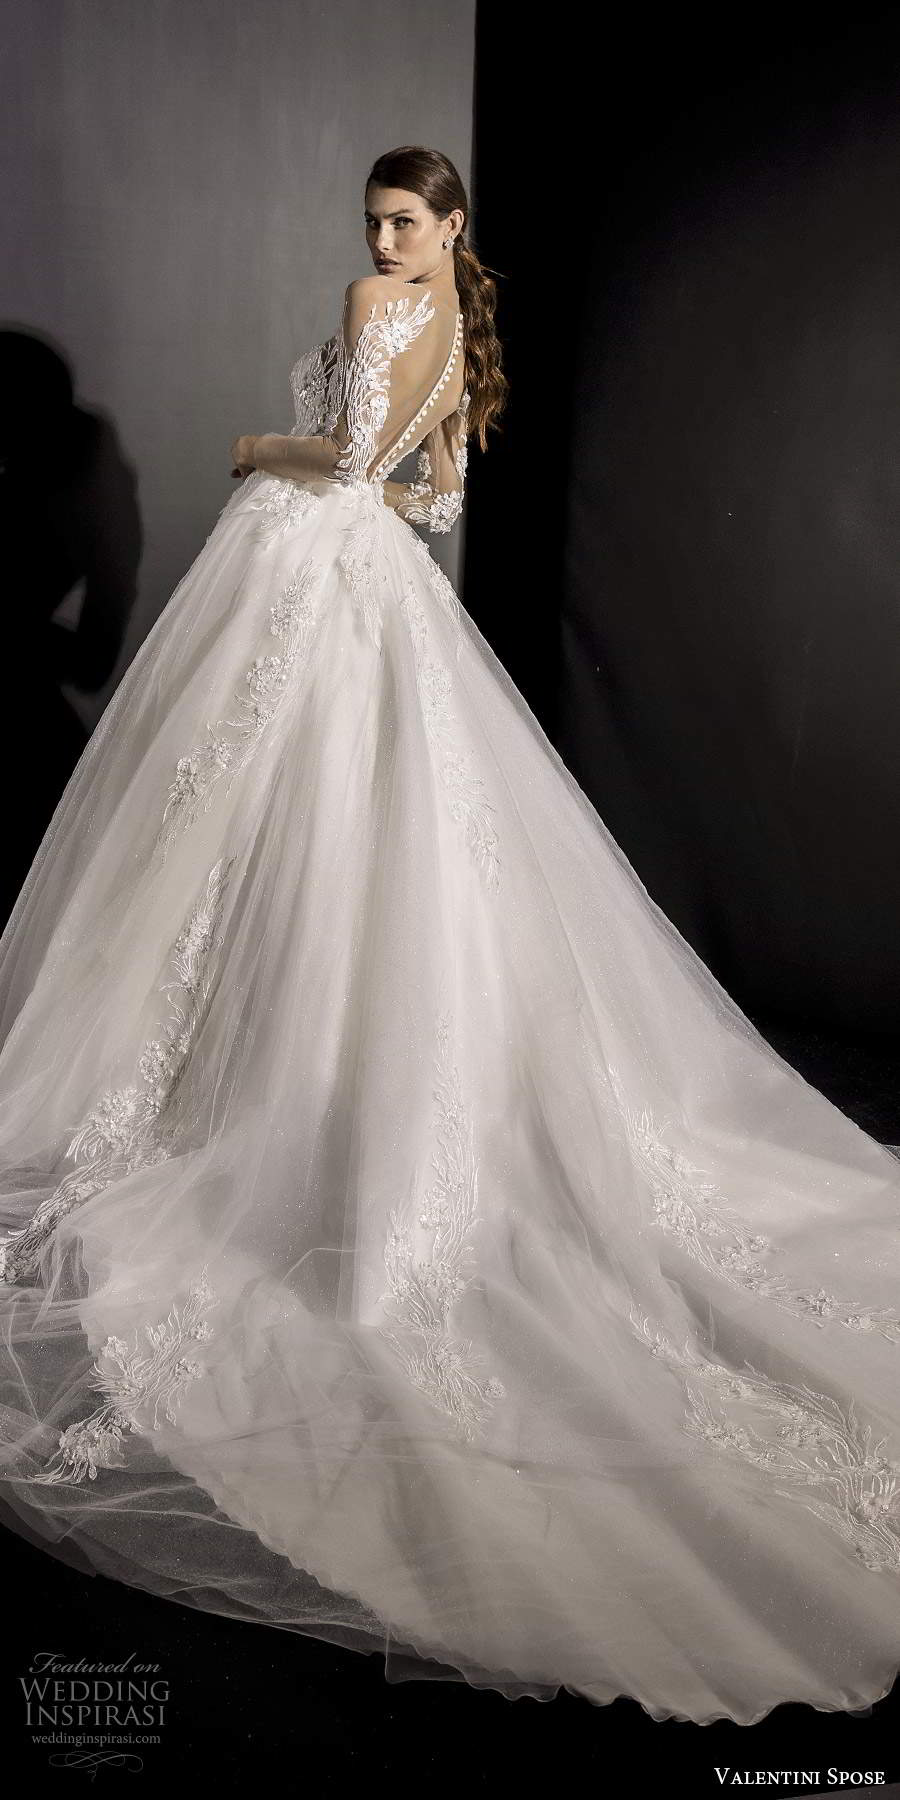 valentini spose fall 2020 wedding dresses wedding inspirasi. Black Bedroom Furniture Sets. Home Design Ideas